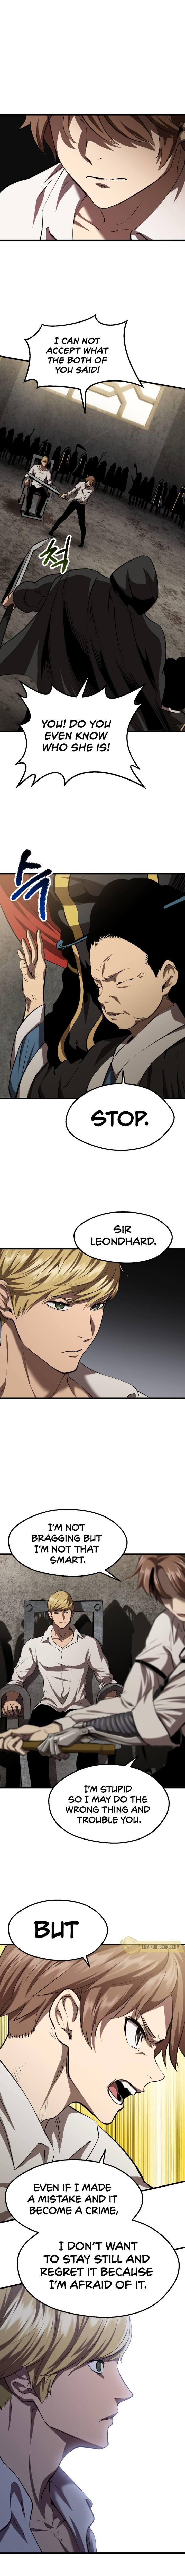 Survival Story Of A Sword King In A Fantasy World Chapter 104 page 12 - Mangakakalots.com